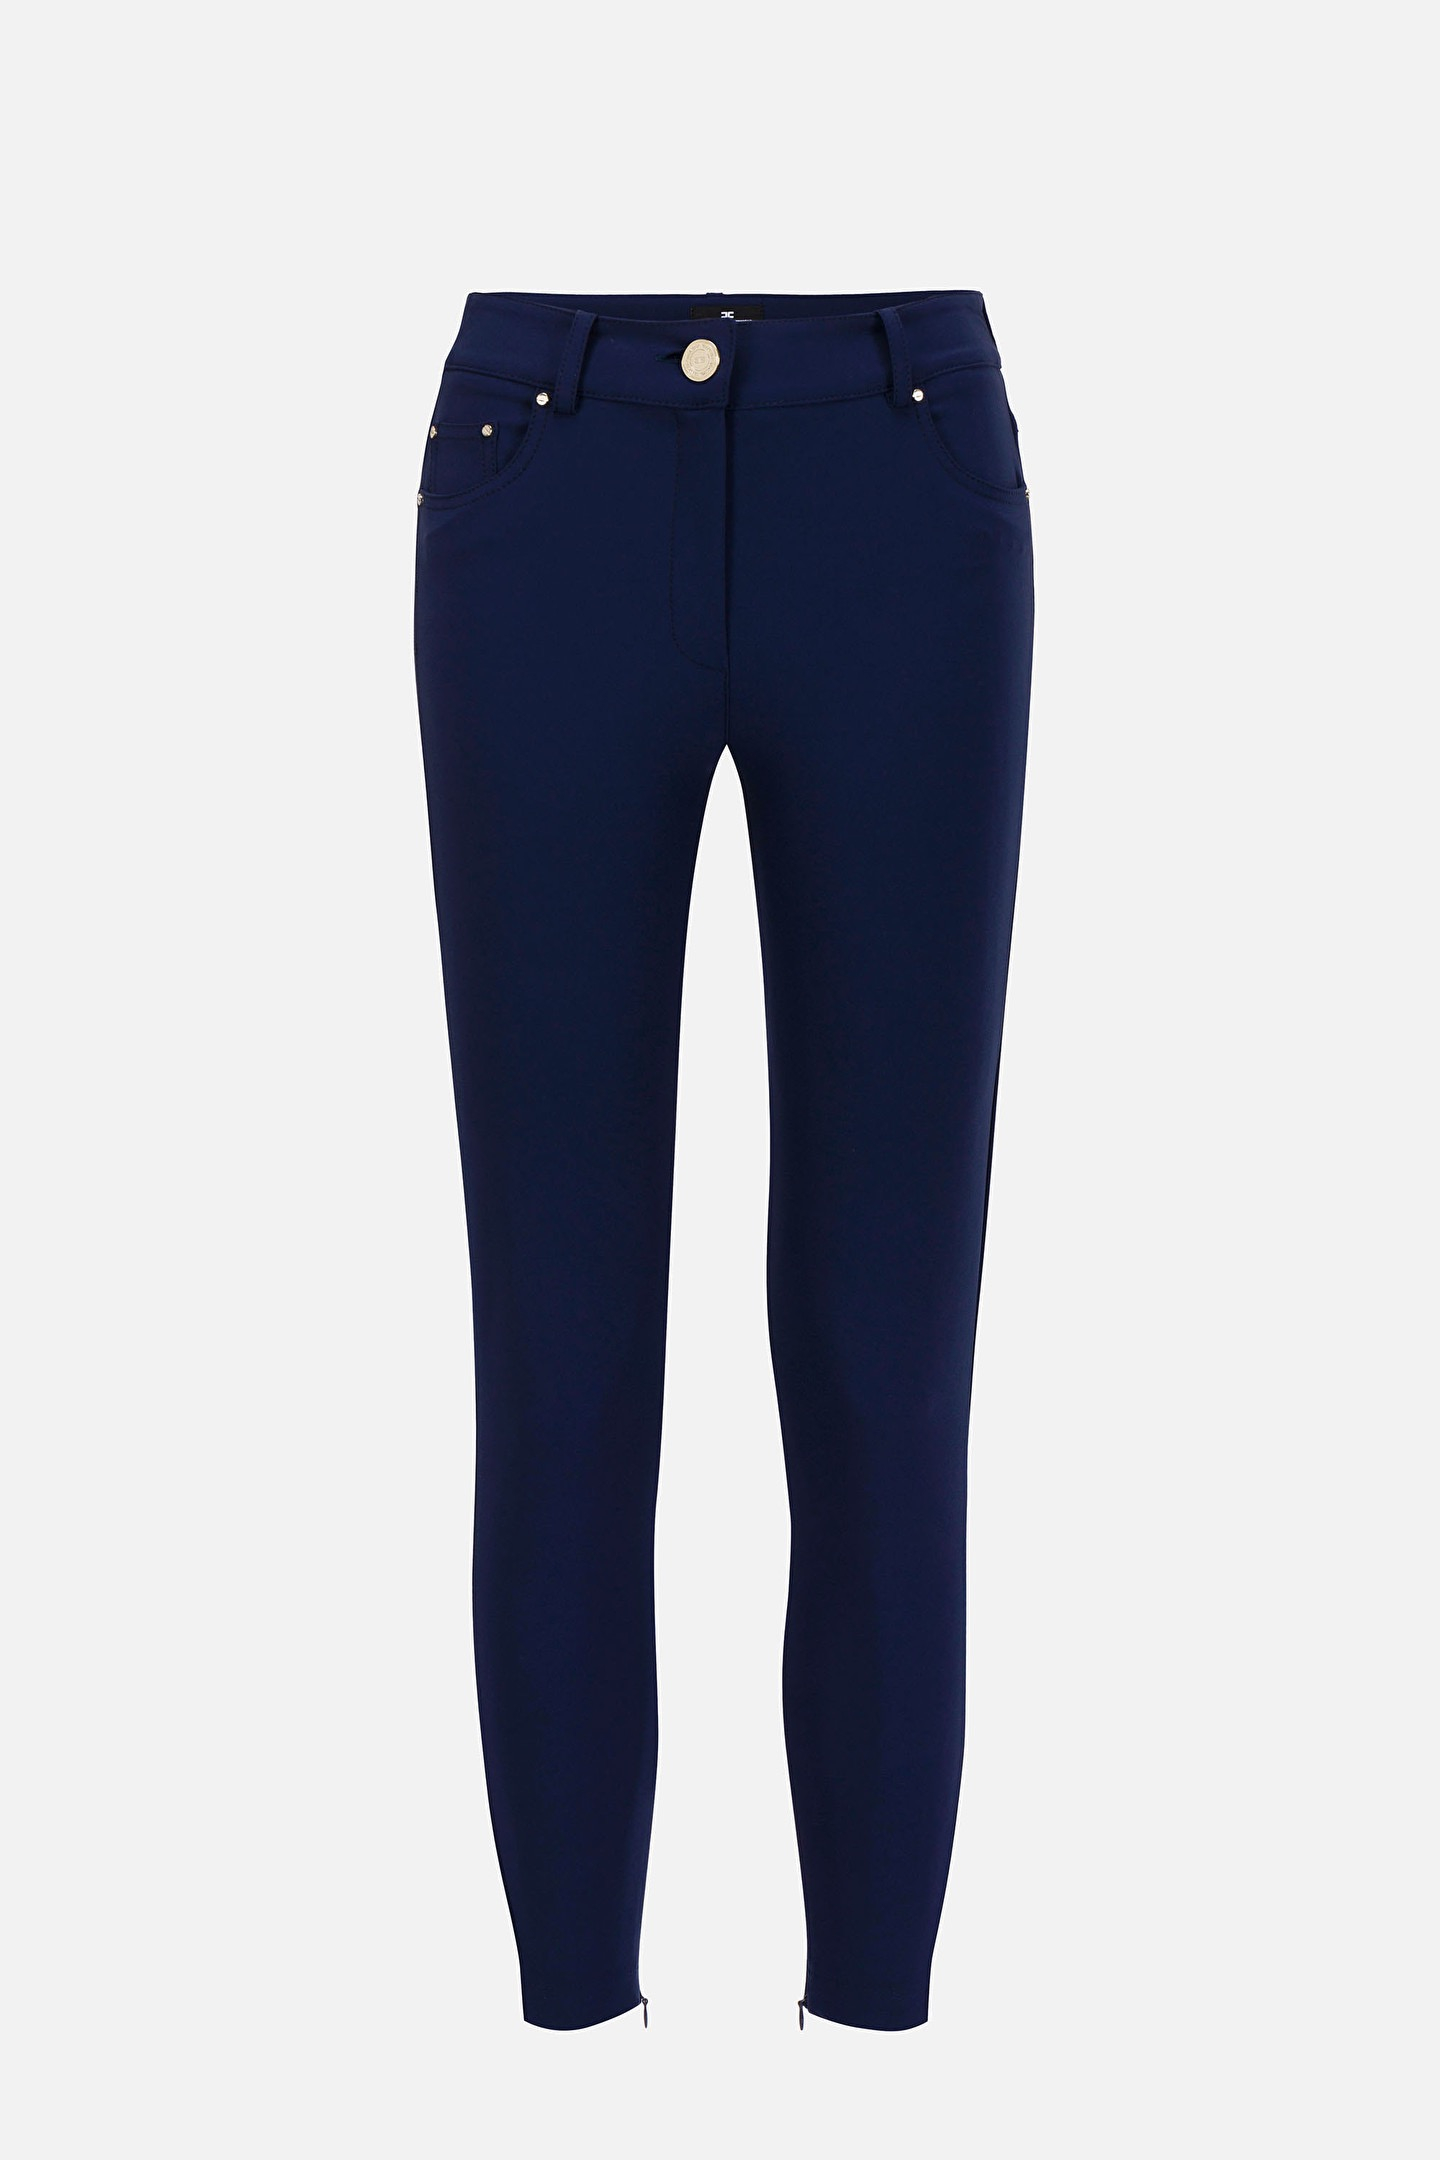 Pantalone Stretch Blu Elisabetta Franchi SS20